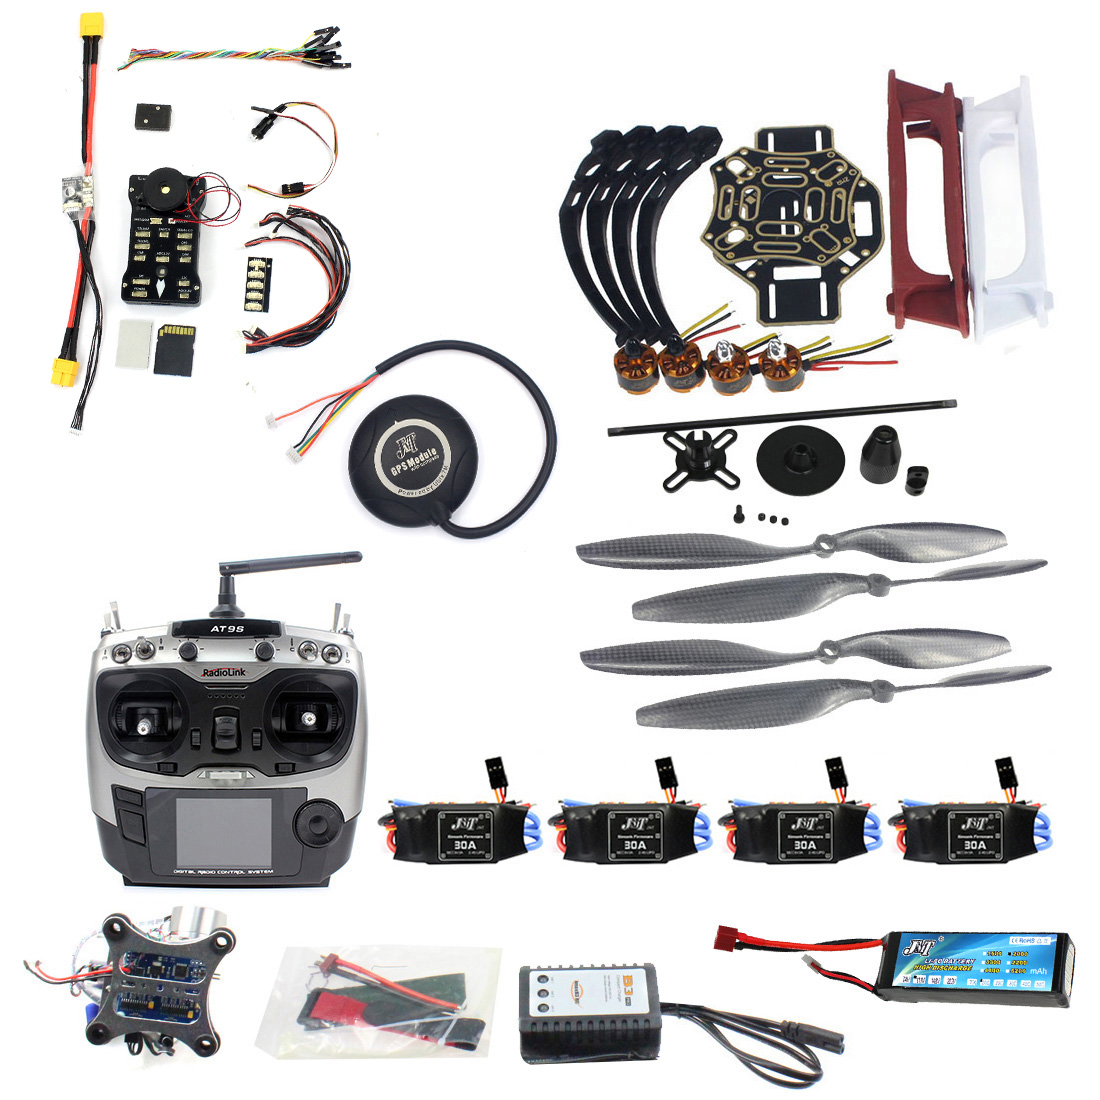 DIY RC FPV Drone Kit 4-eje Quadcopter con F450 del 450 PIXHAWK PXI PX4 de Control de vuelo 920KV Motor GPS AT9S transmisor RX